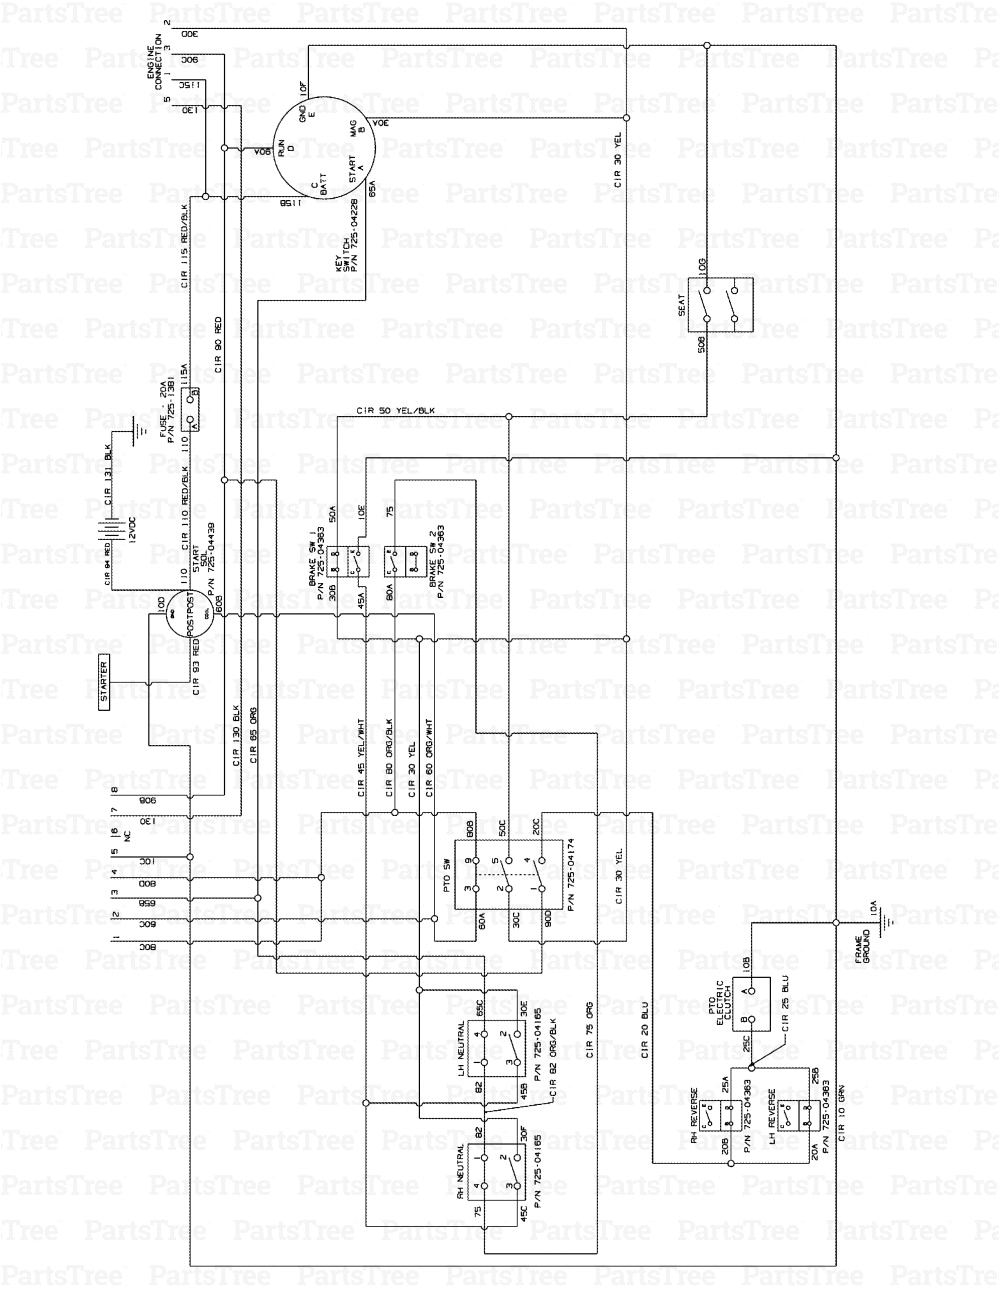 Cub Cadet Zero Turn Mower Wiring Diagram Cub Cadet Safety Switch Diagram Wiring Library